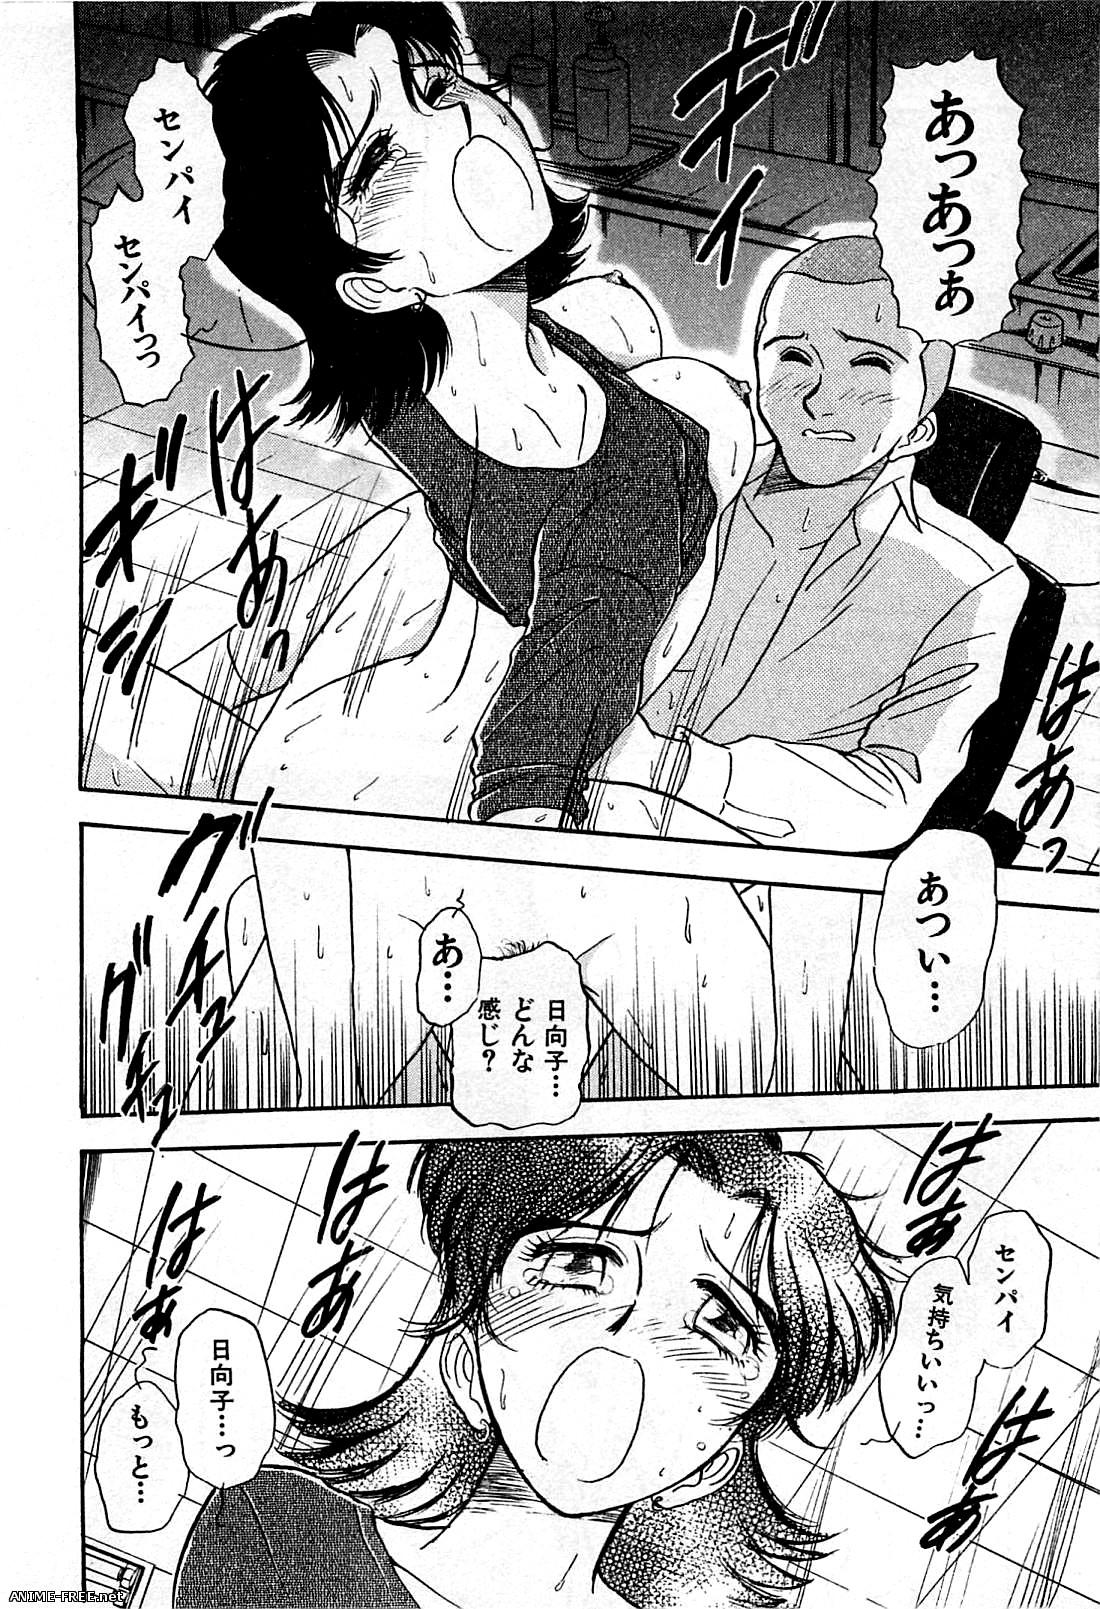 Yamamoto Johanne / ANARCOMIX / Genda Shou — Сборник хентай манги [Cen] [JAP,ENG] Manga Hentai